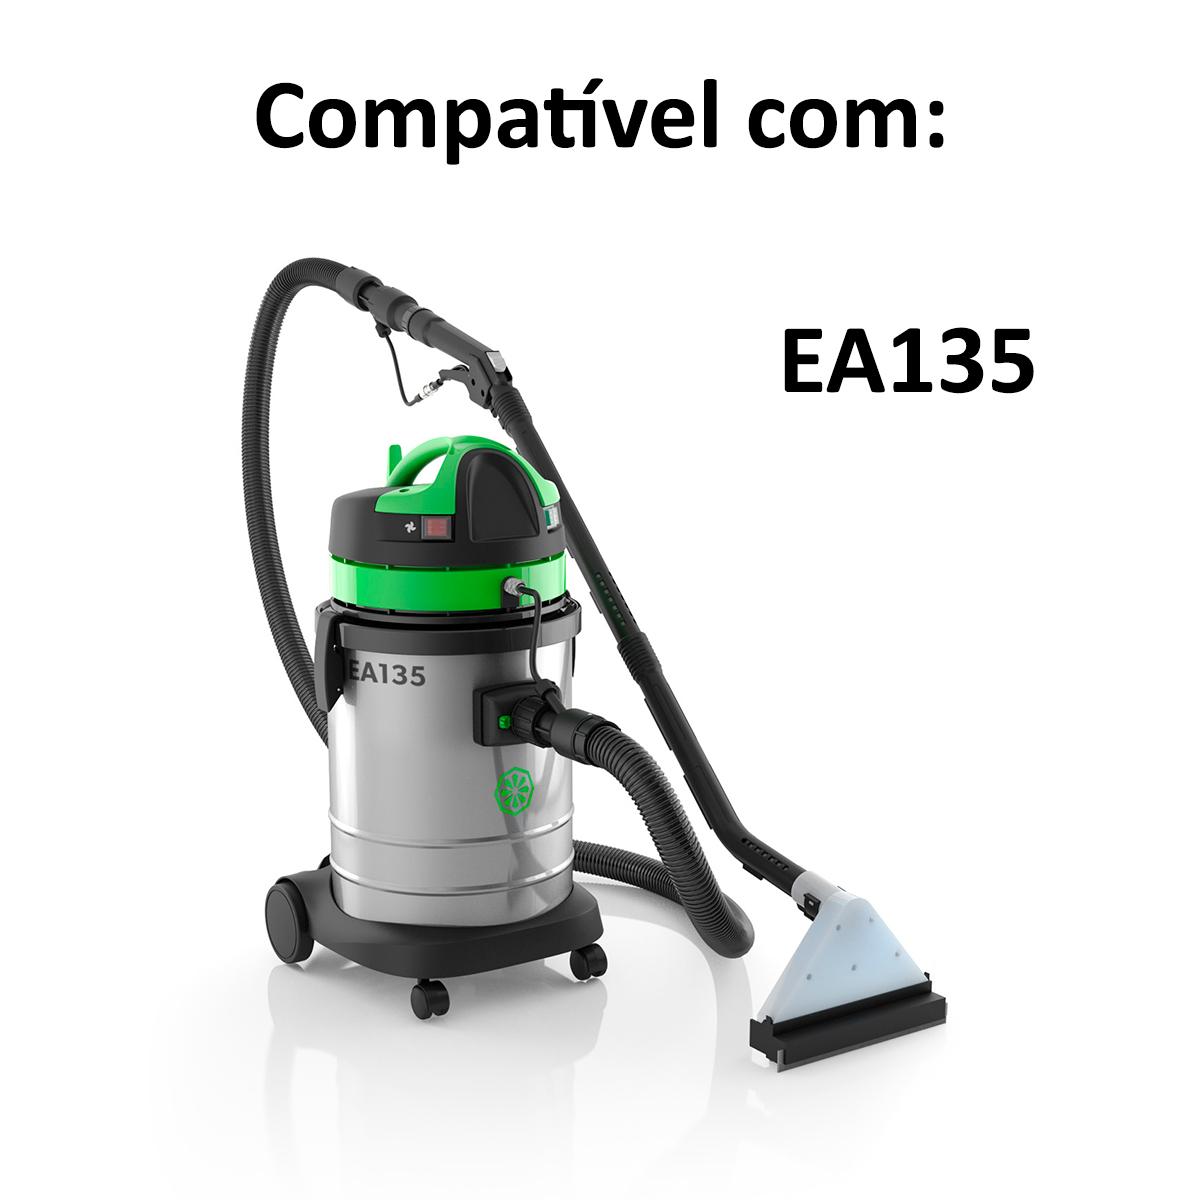 Tubo Extensor curvo para Extratora IPC EA135 EP150 Lava Pro, Lavaclean 36mm Original